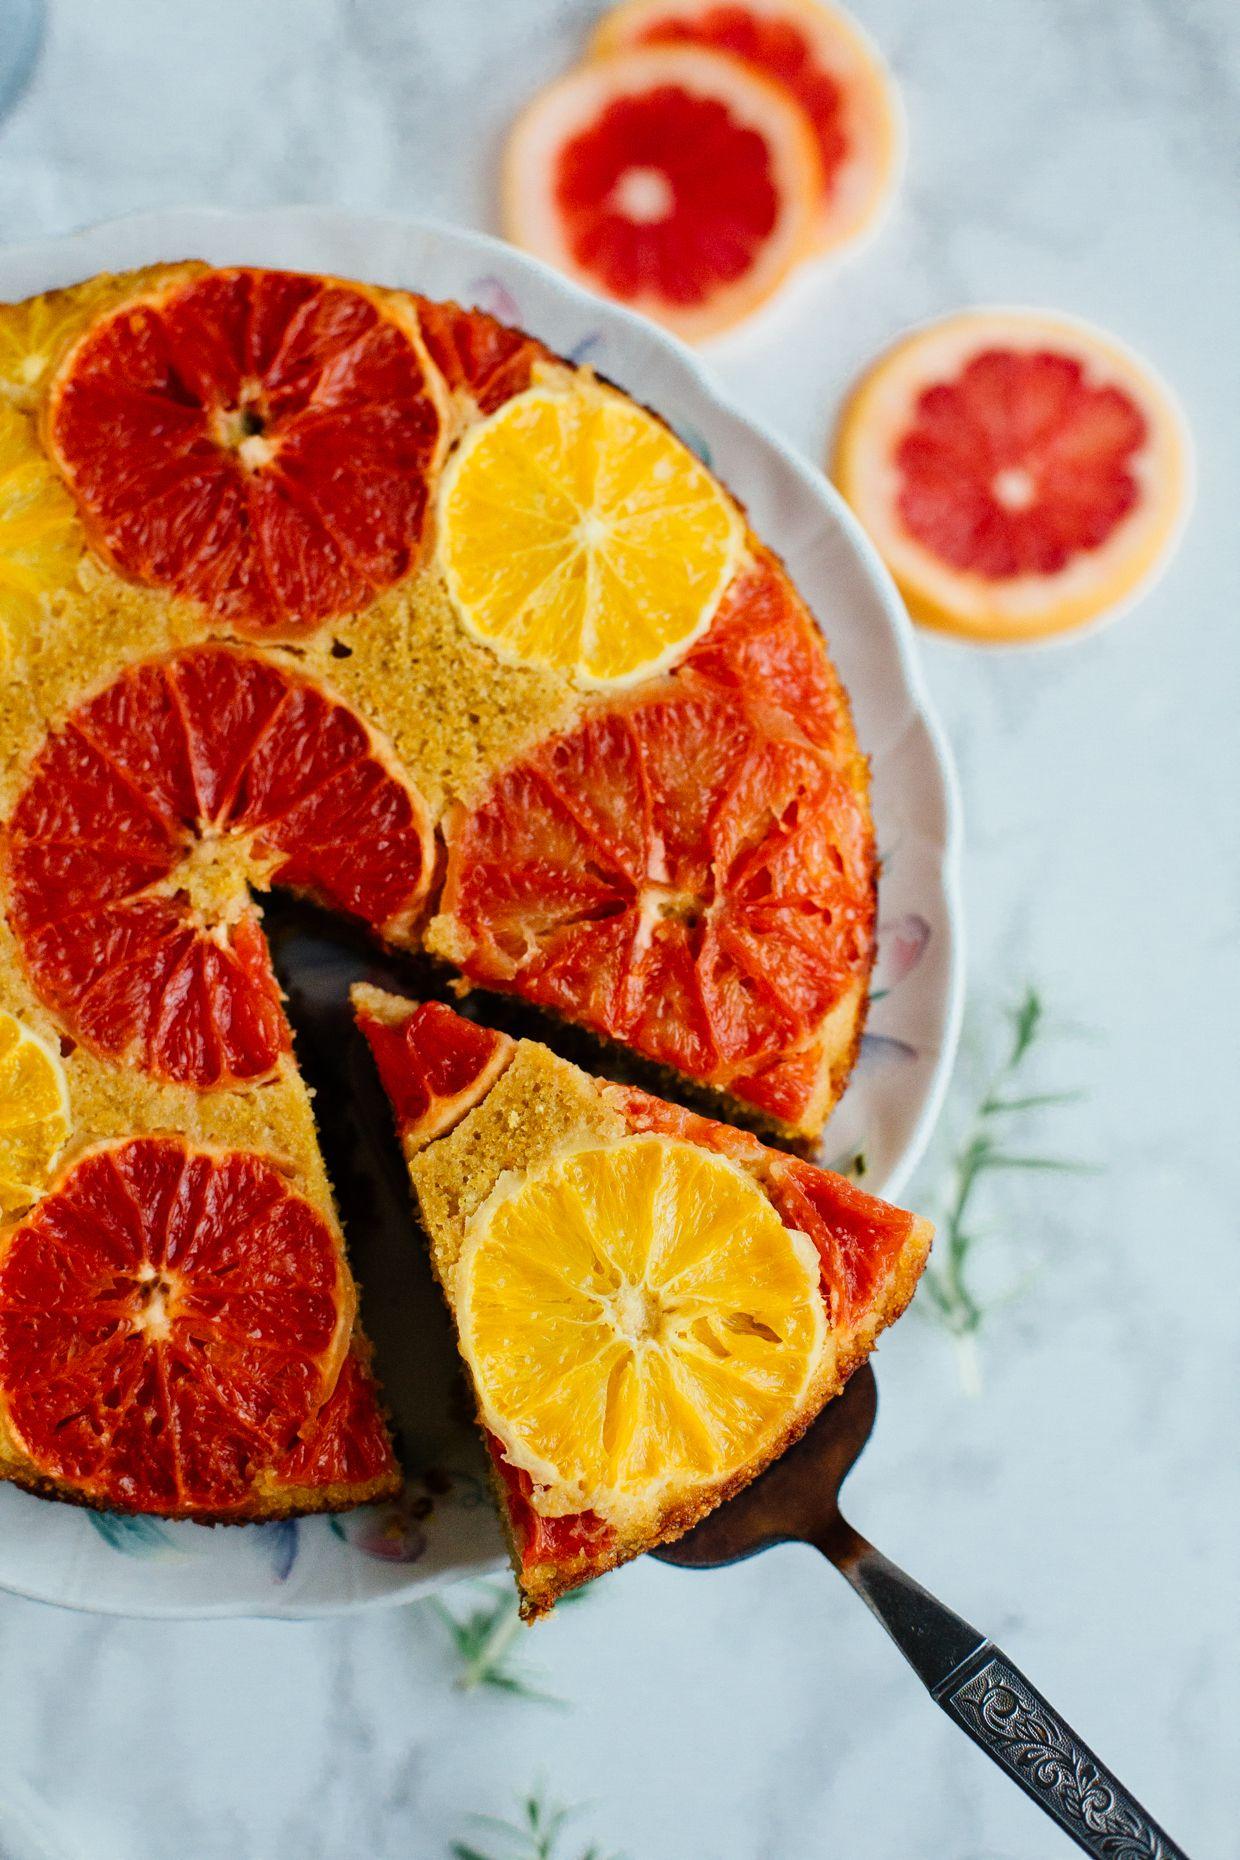 Citrus and rosemary olive oil polenta cake